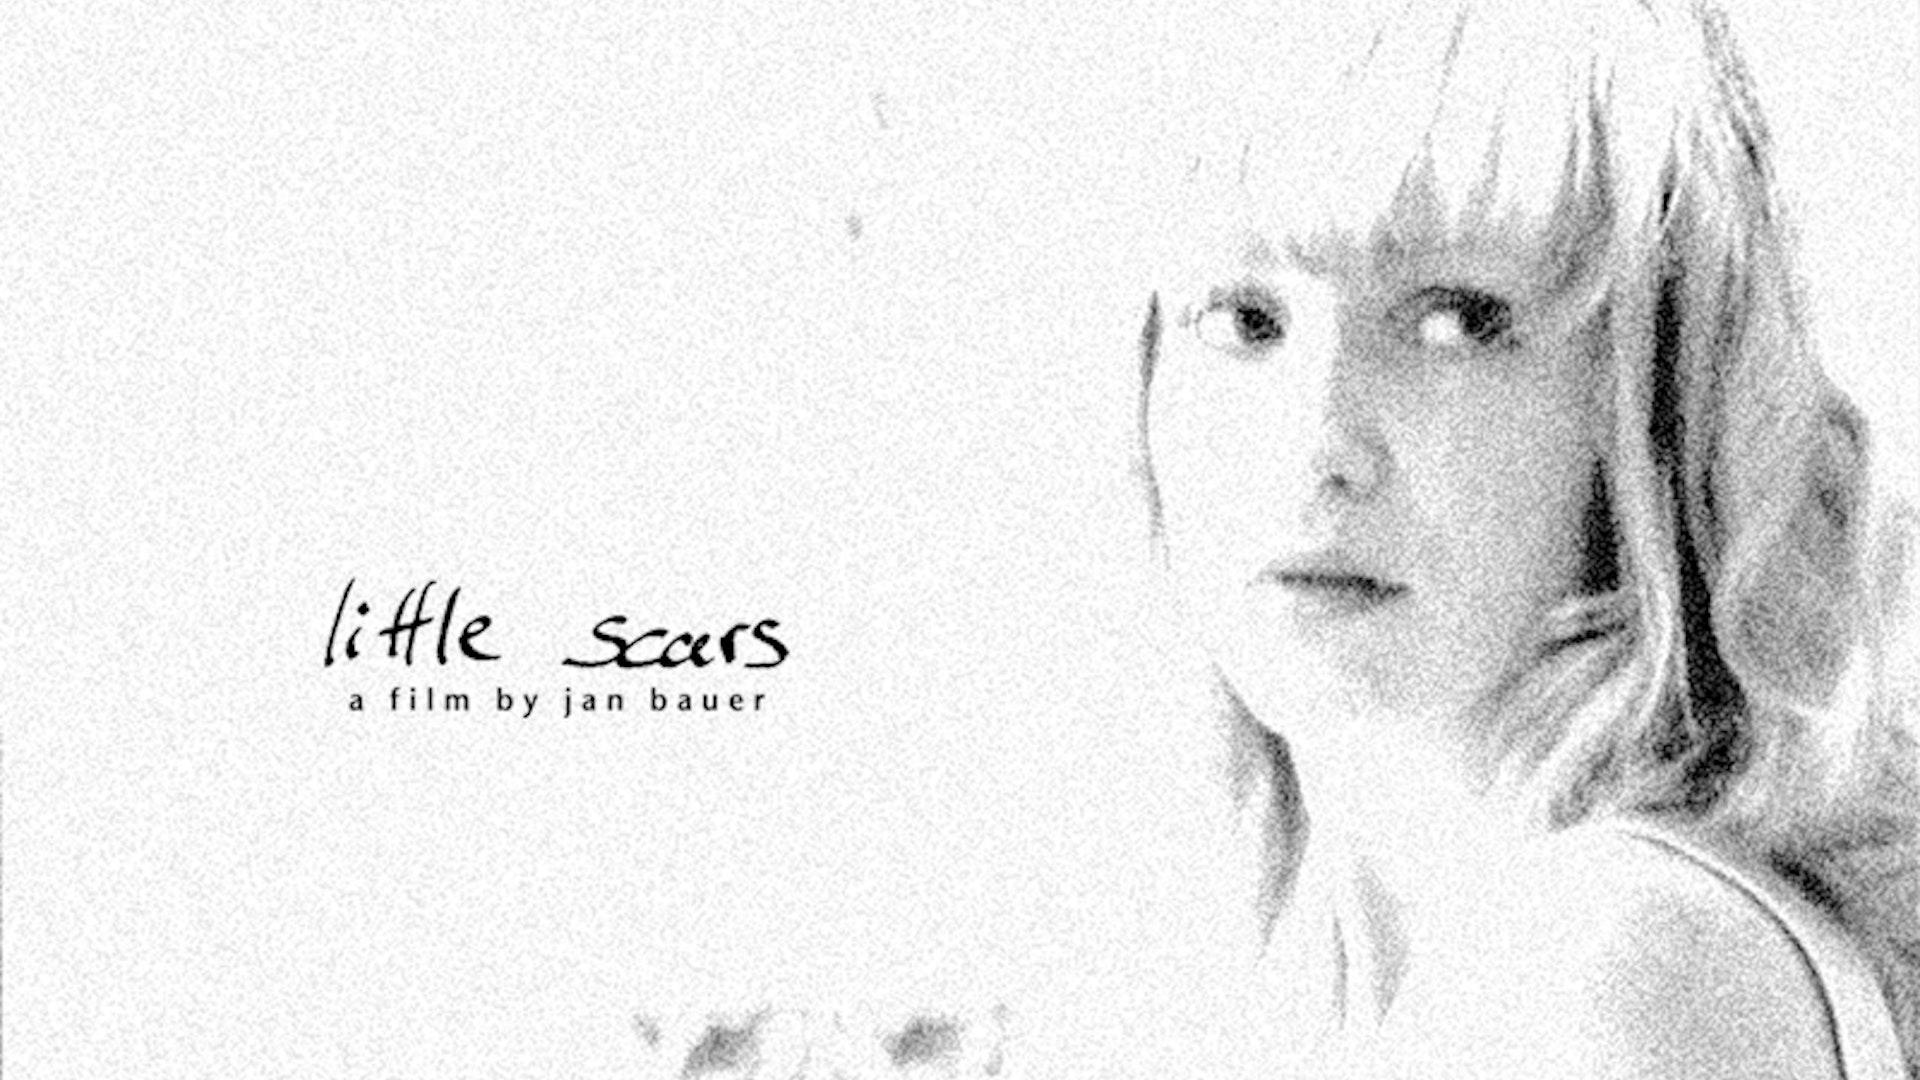 Little Scars Poster Frame mit Logo